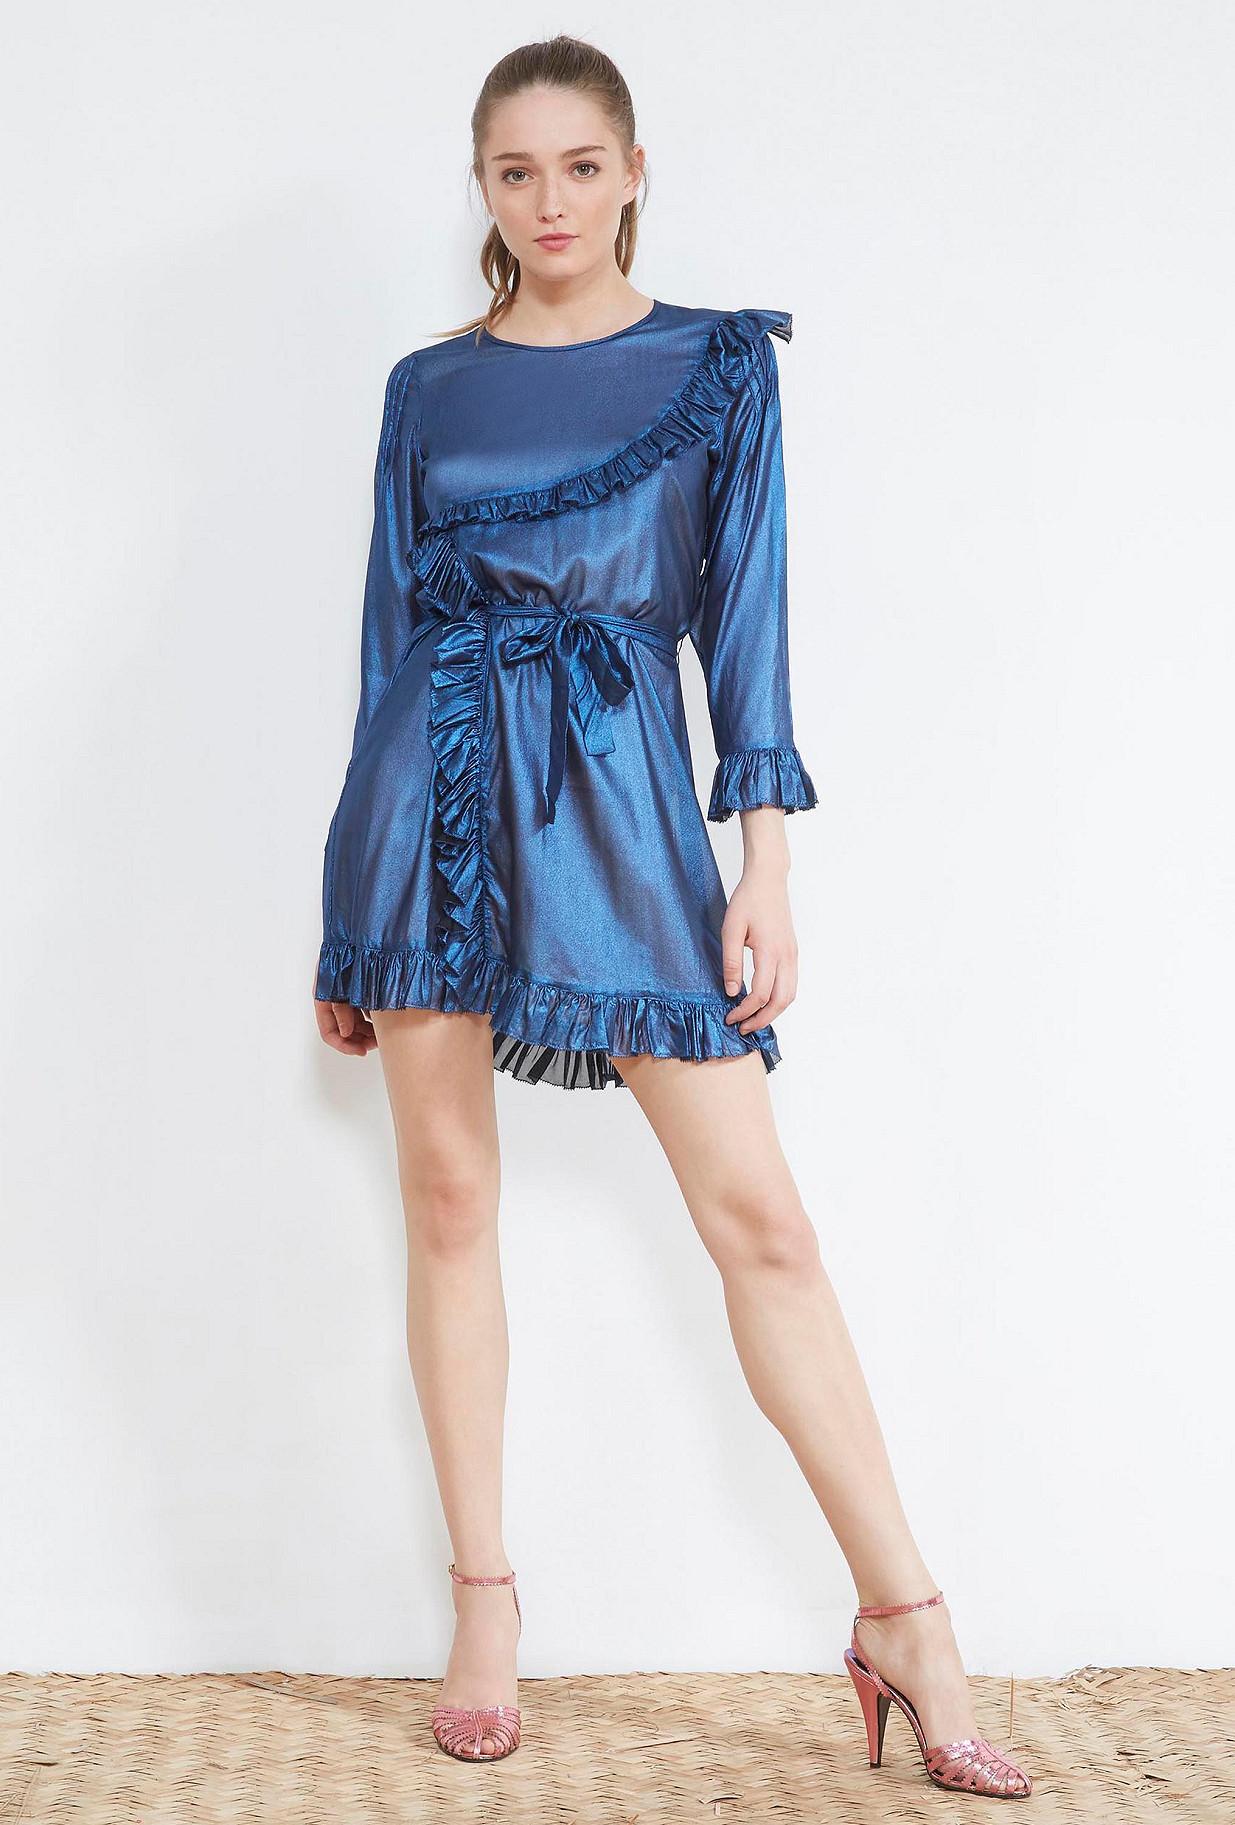 clothes store DRESS  Stella french designer fashion Paris